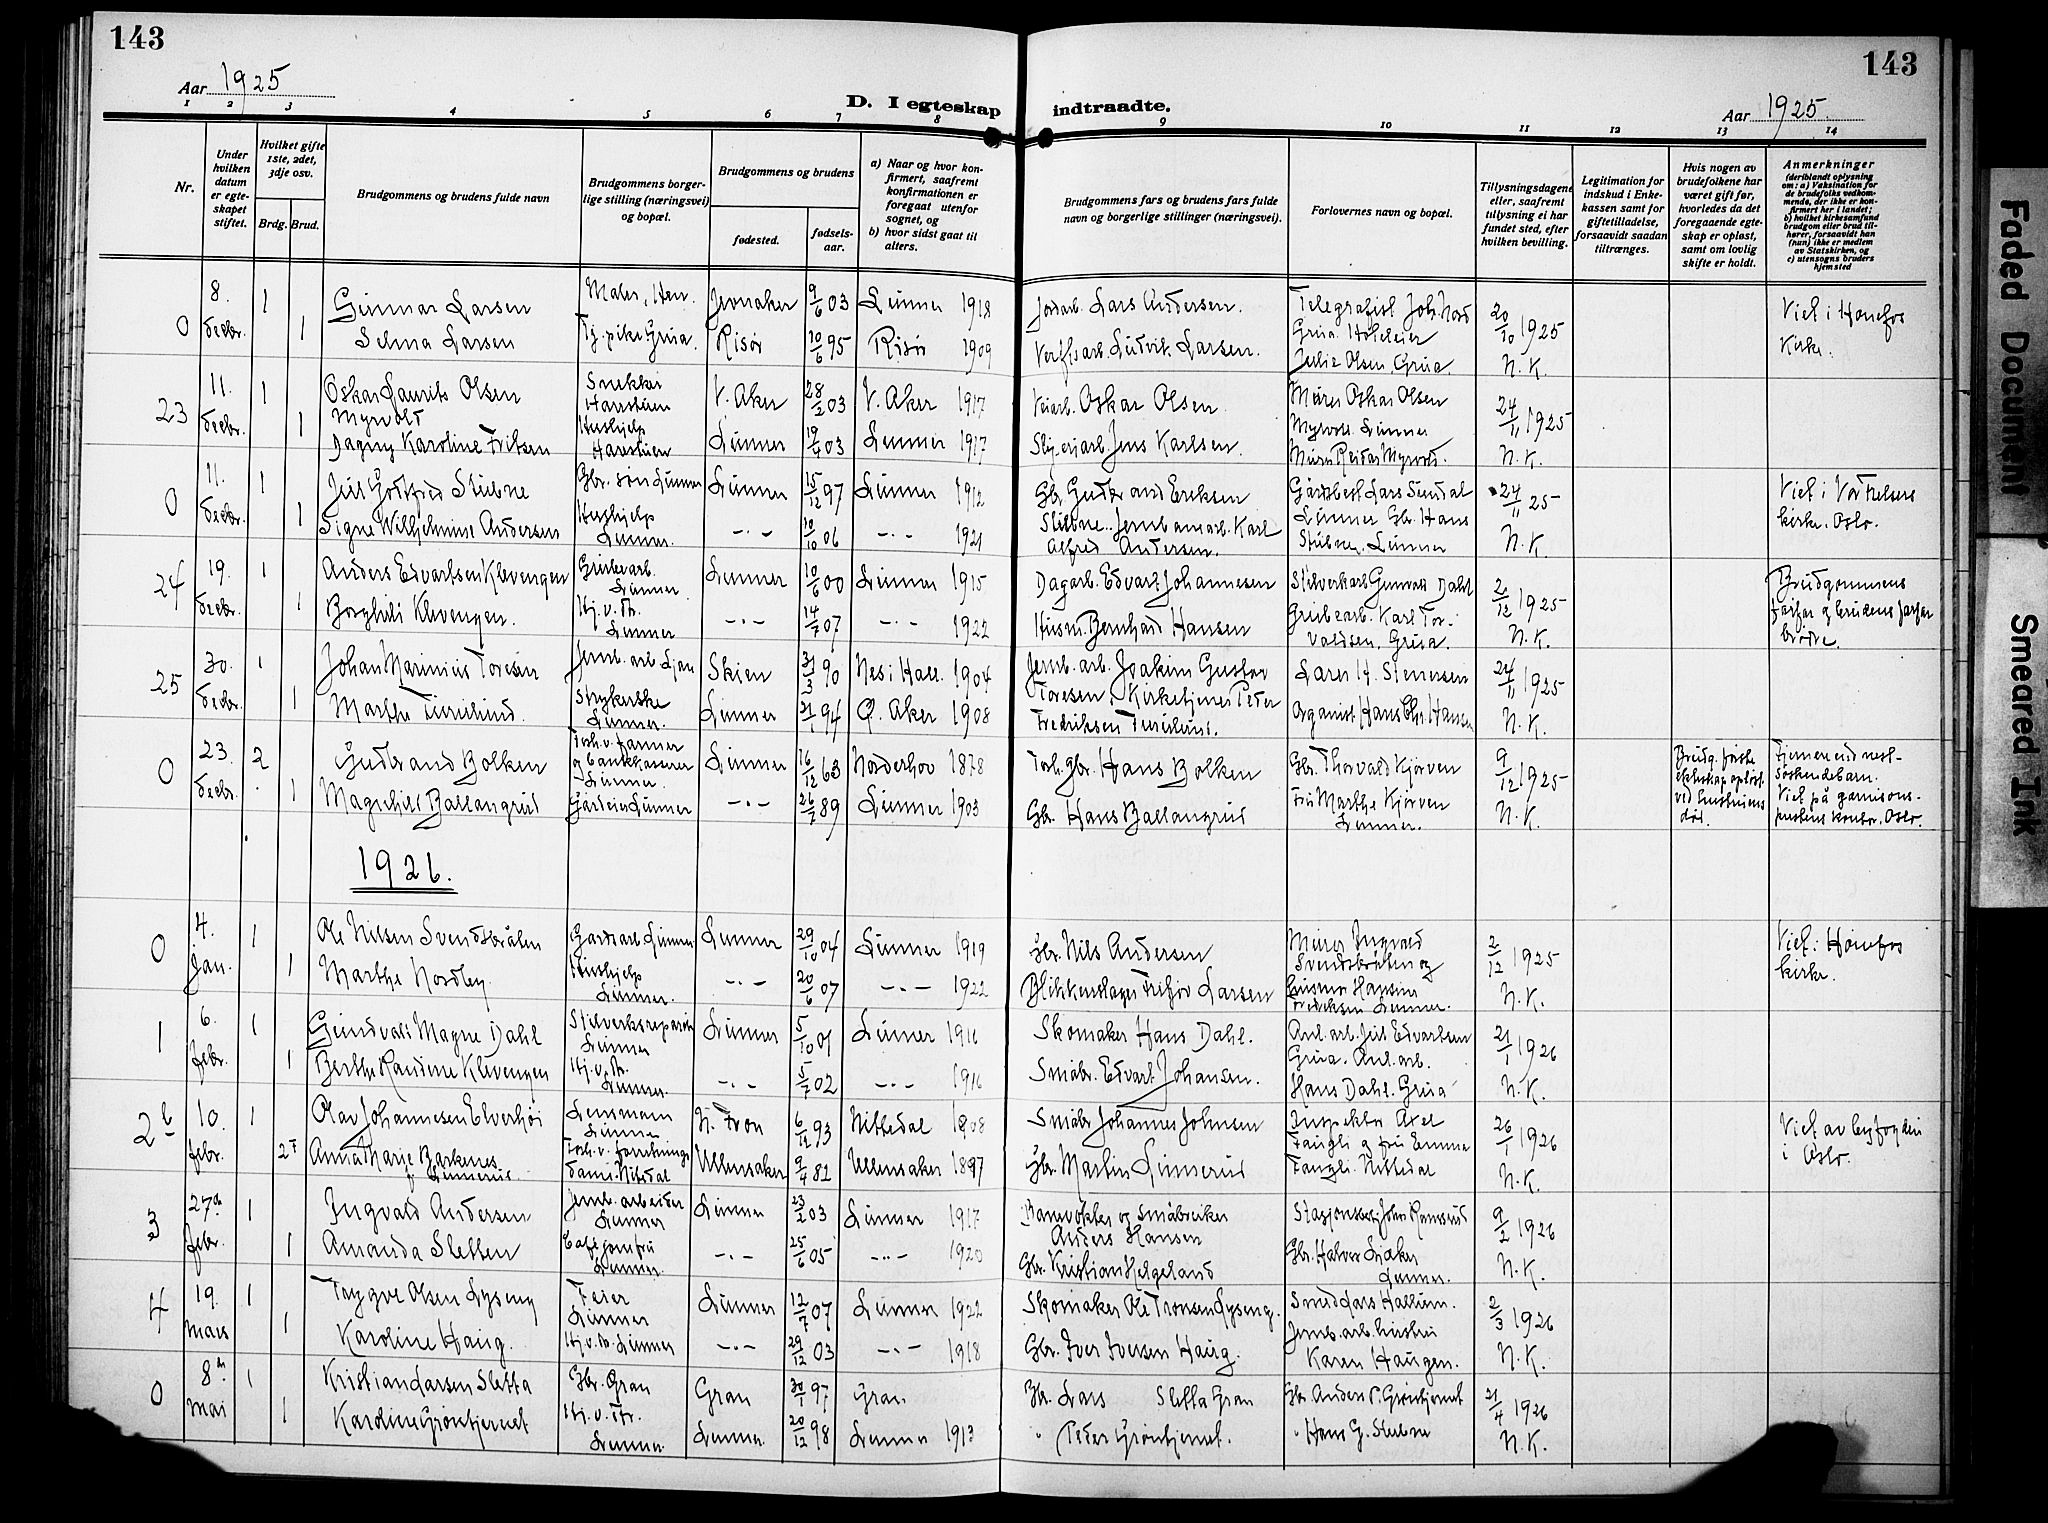 SAH, Lunner prestekontor, H/Ha/Hab/L0002: Klokkerbok nr. 2, 1923-1933, s. 143